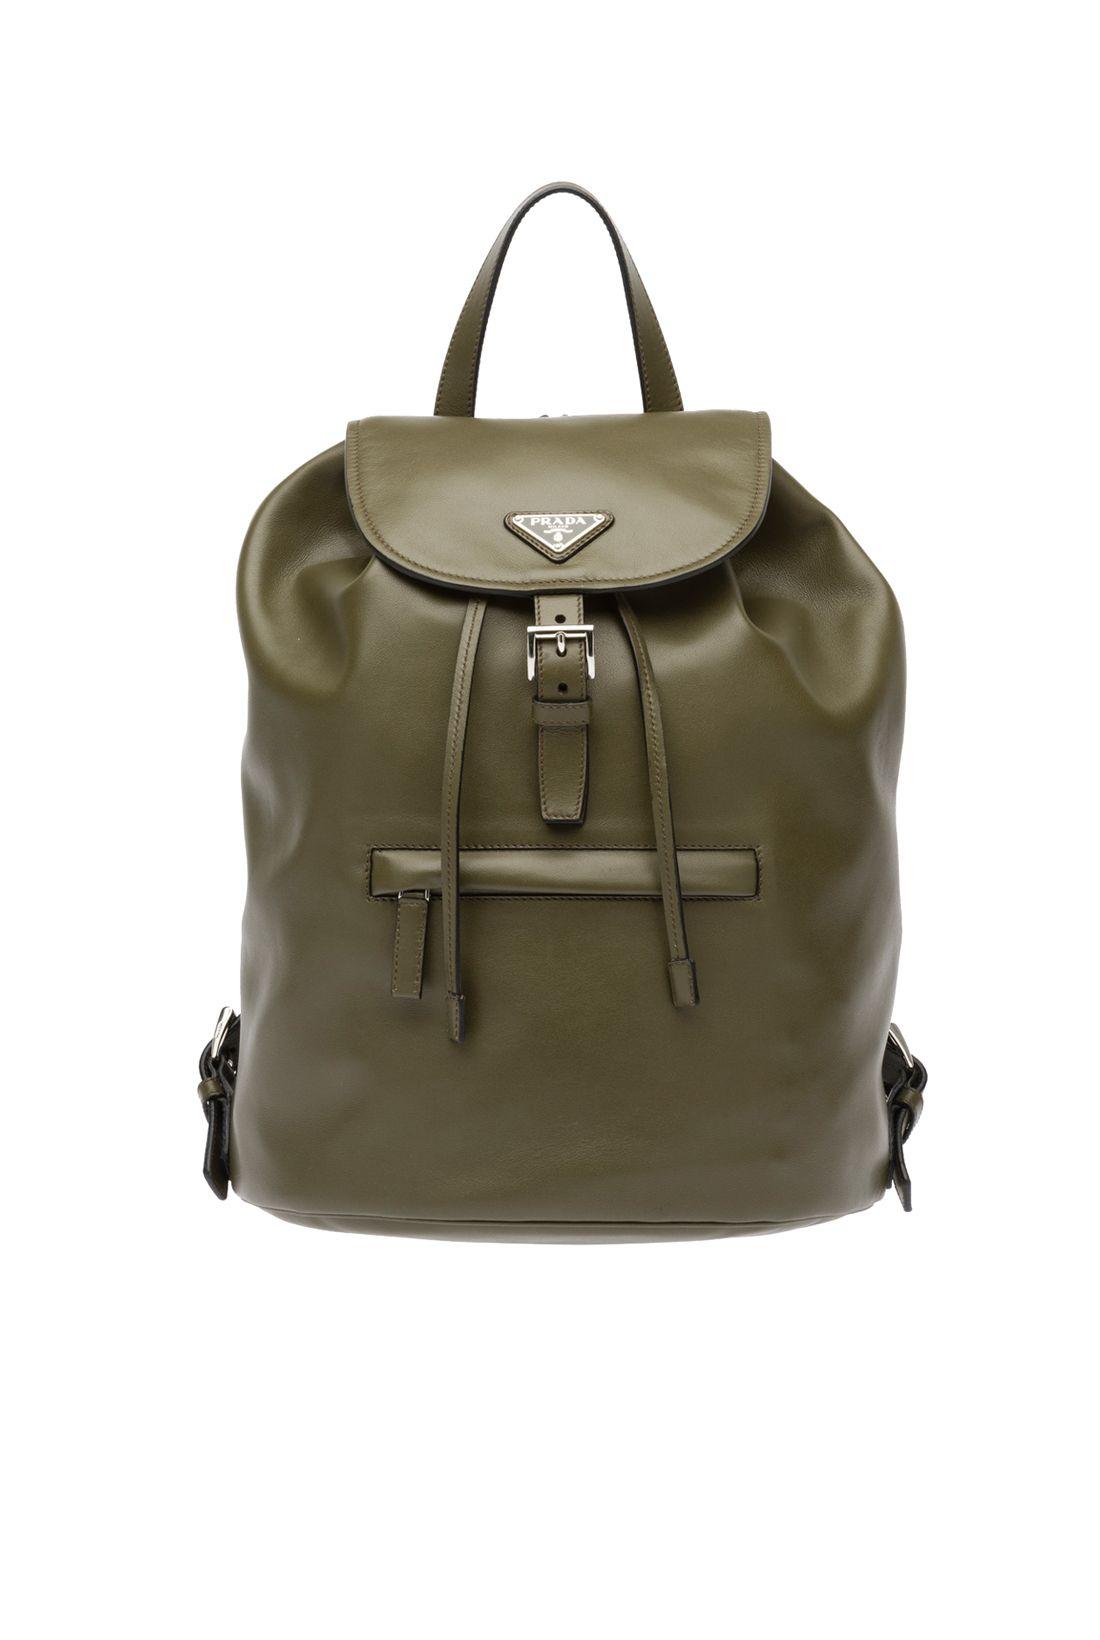 099b8ce927af ... germany buy the best backpacks prada style 2cc78 3b60a